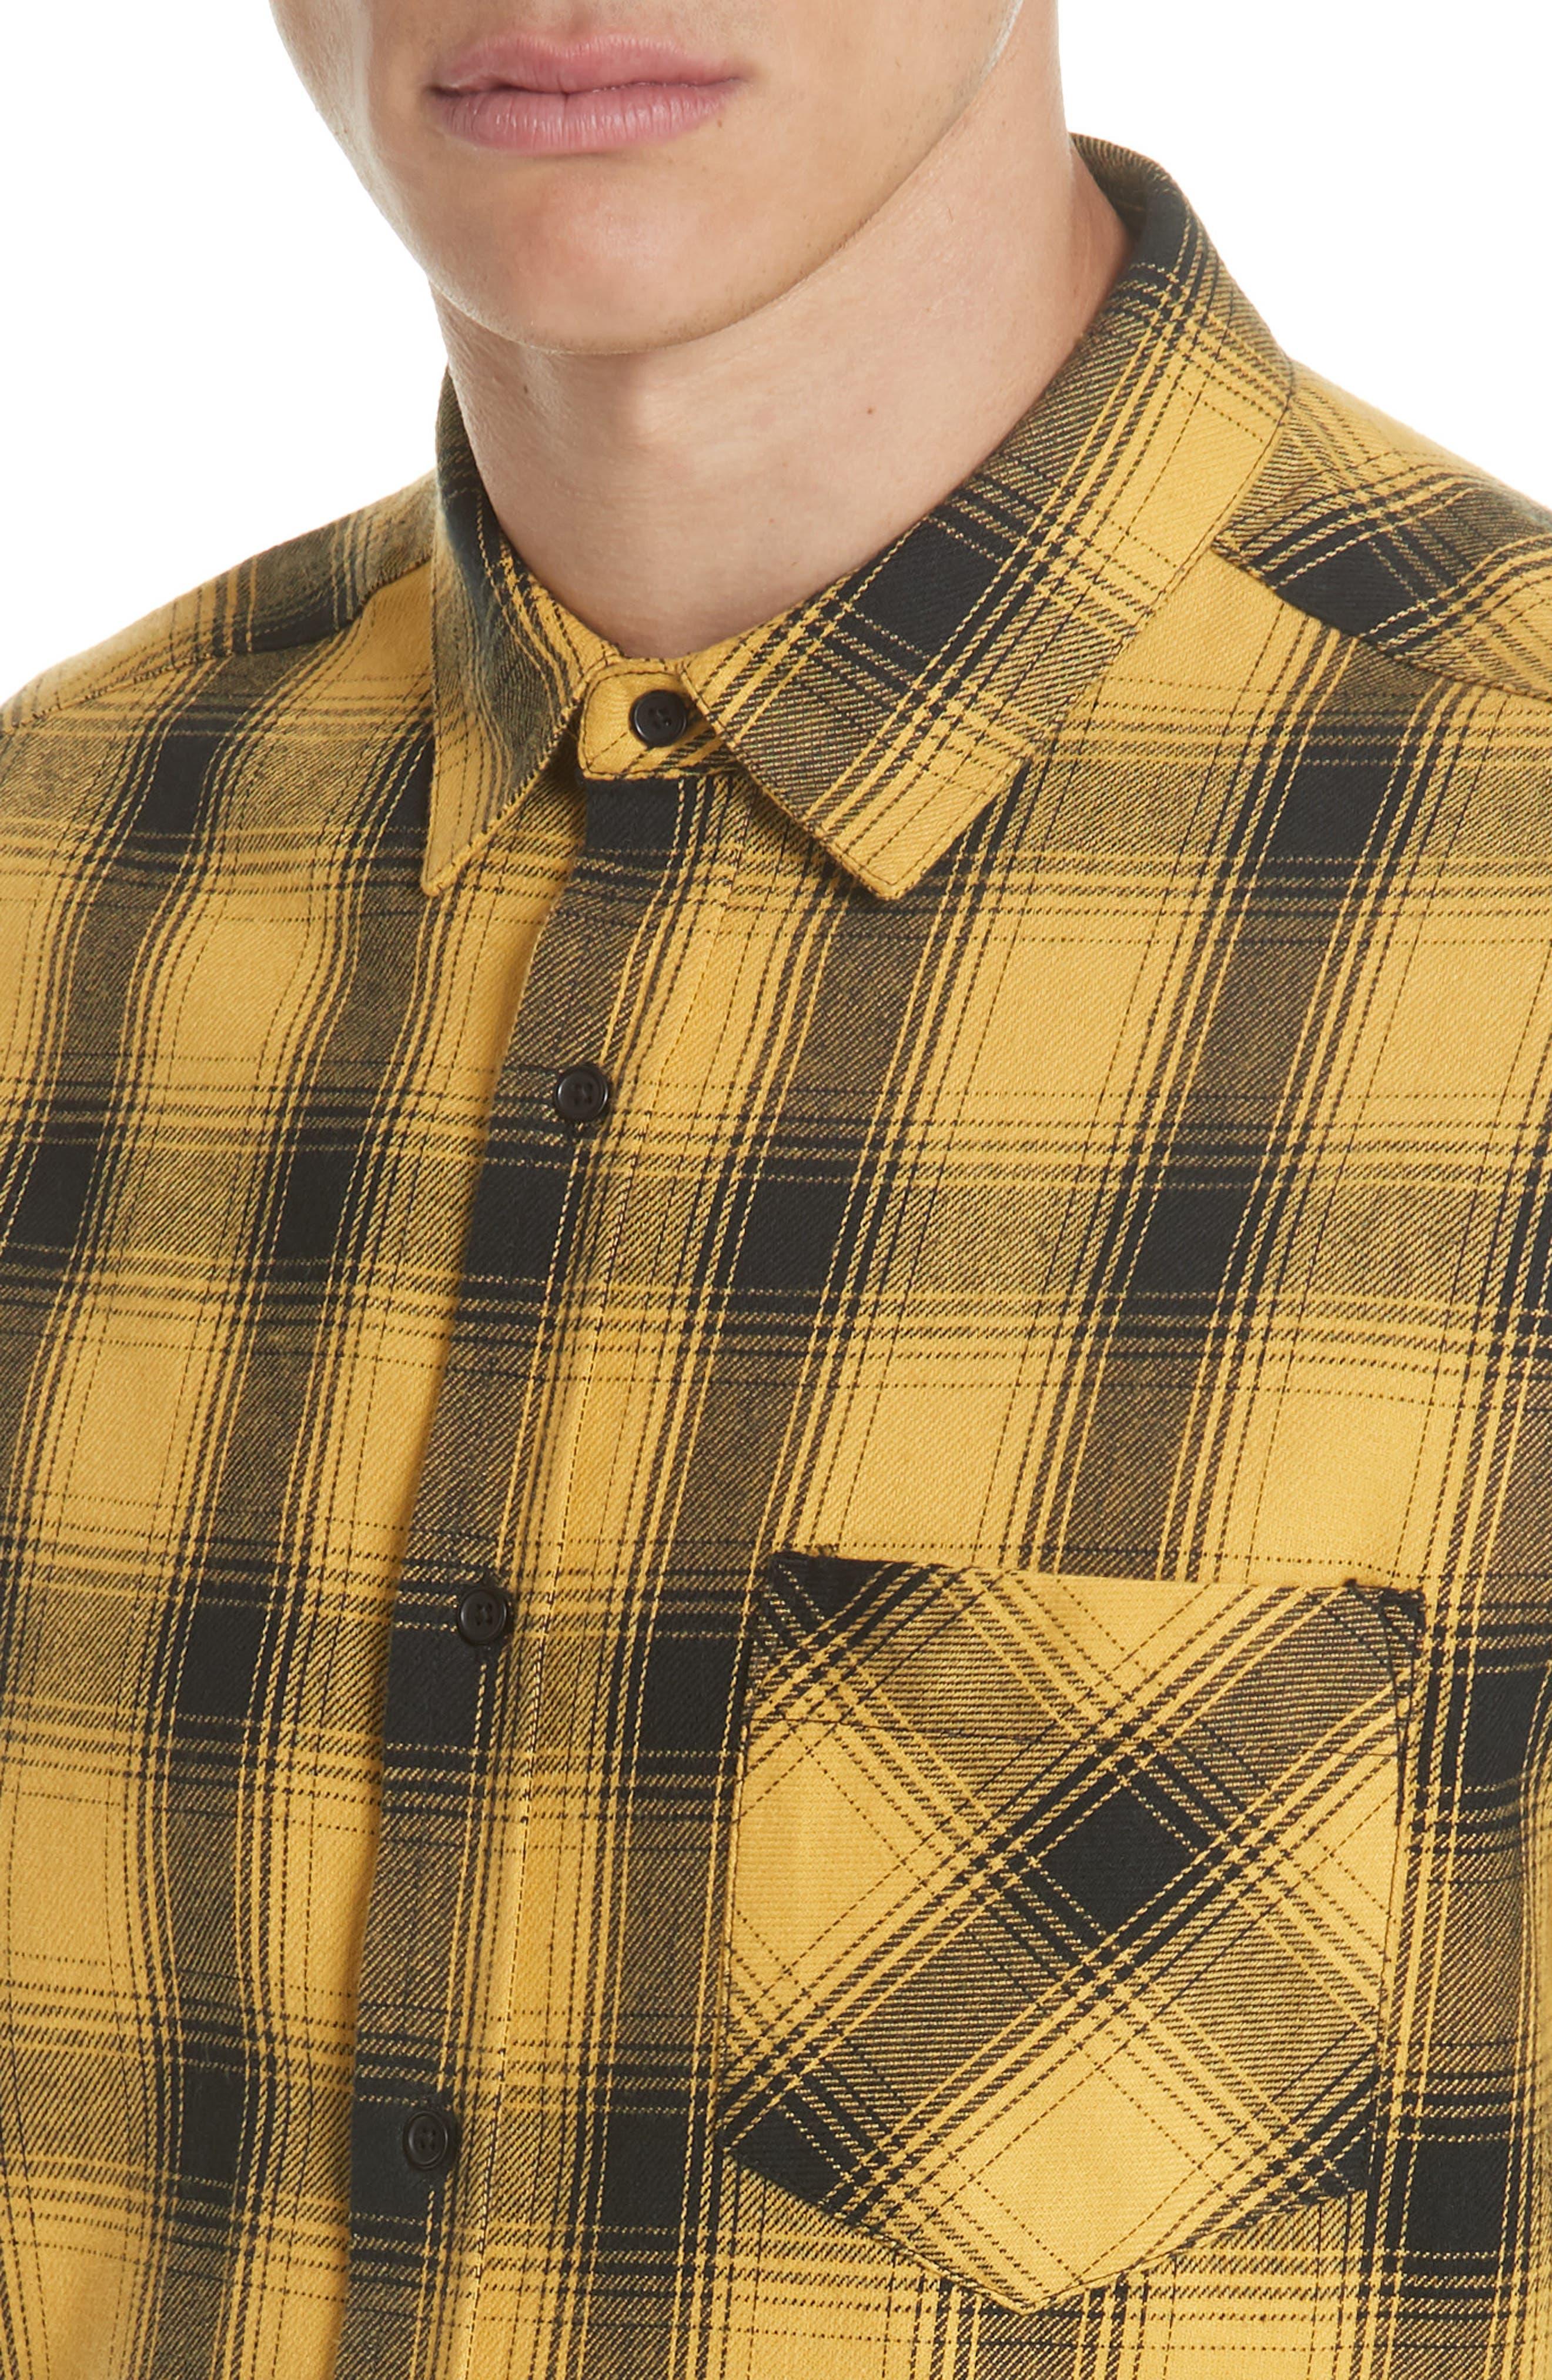 Max Plaid Flannel Shirt,                             Alternate thumbnail 2, color,                             GOLD PLAID